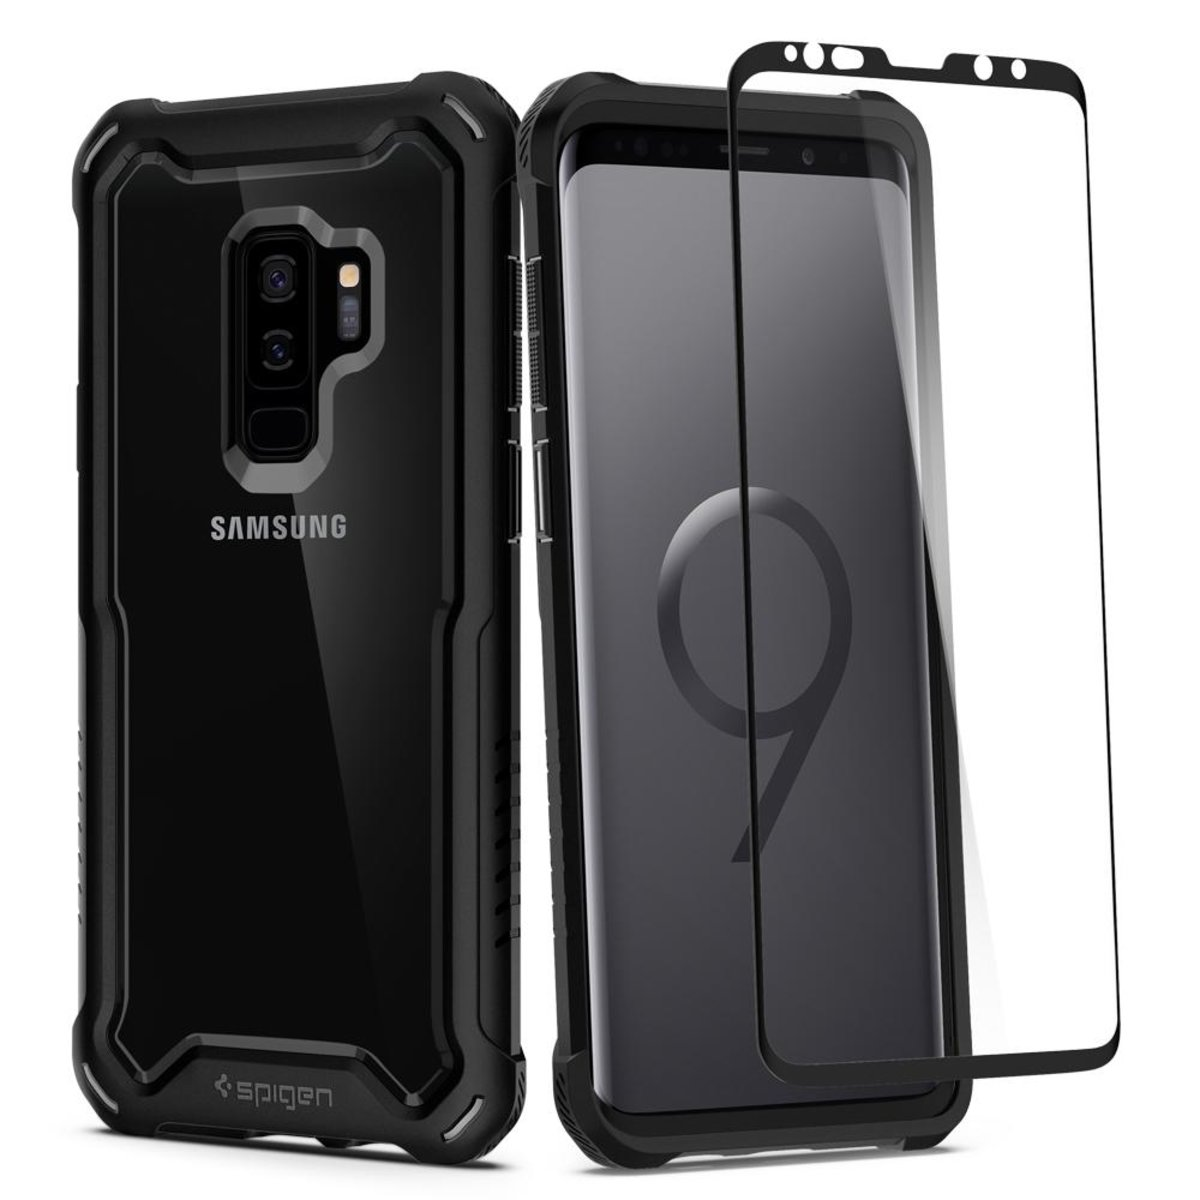 Galaxy S9+ Case Hybrid 360 - Black